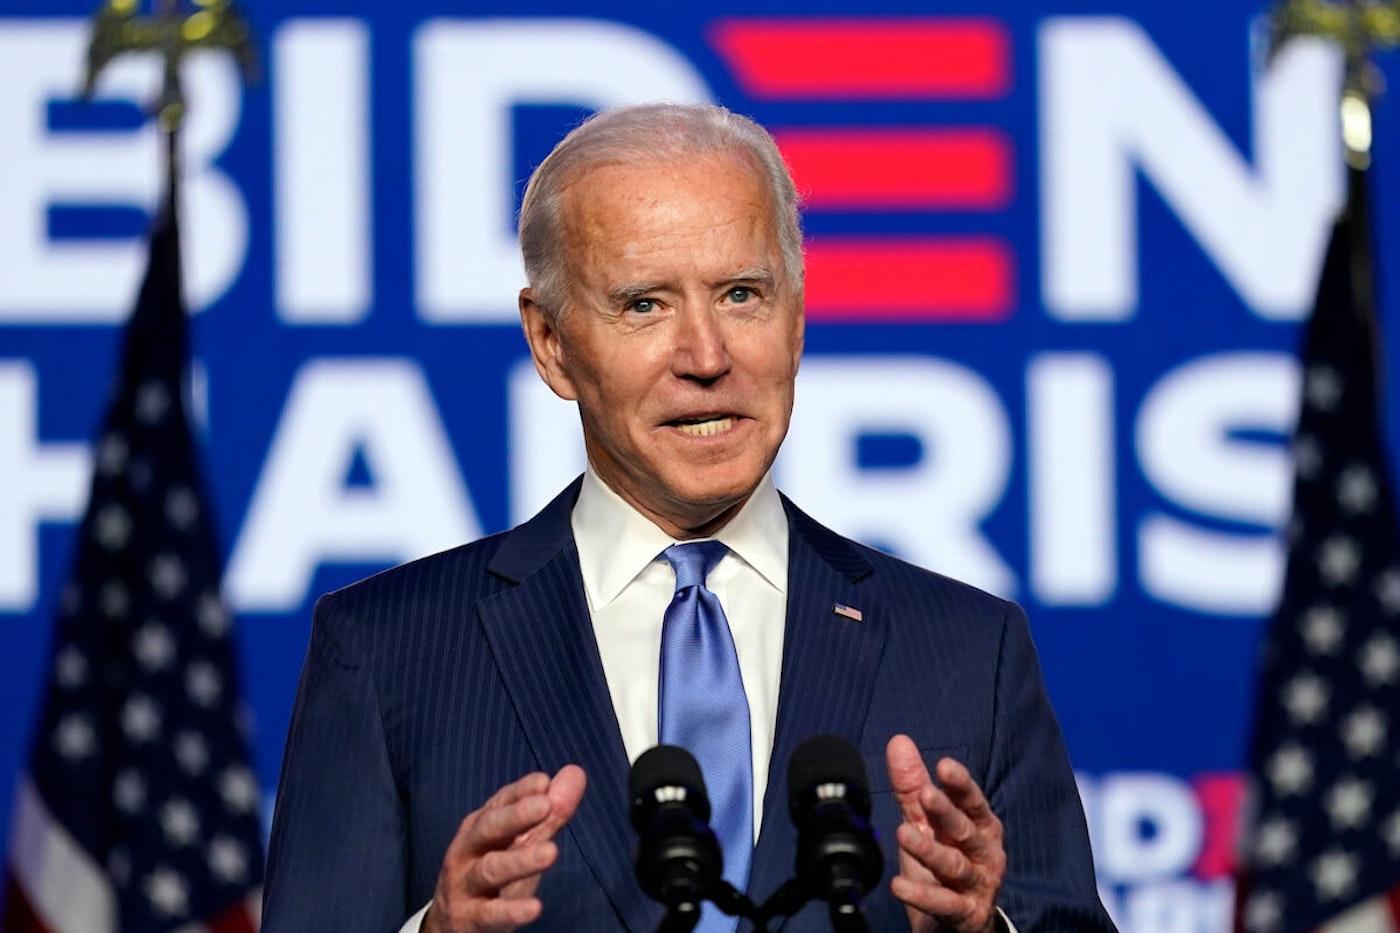 President Joe Biden speaks Friday, Nov. 6, 2020, in Wilmington, Del. (AP Photo/Carolyn Kaster)